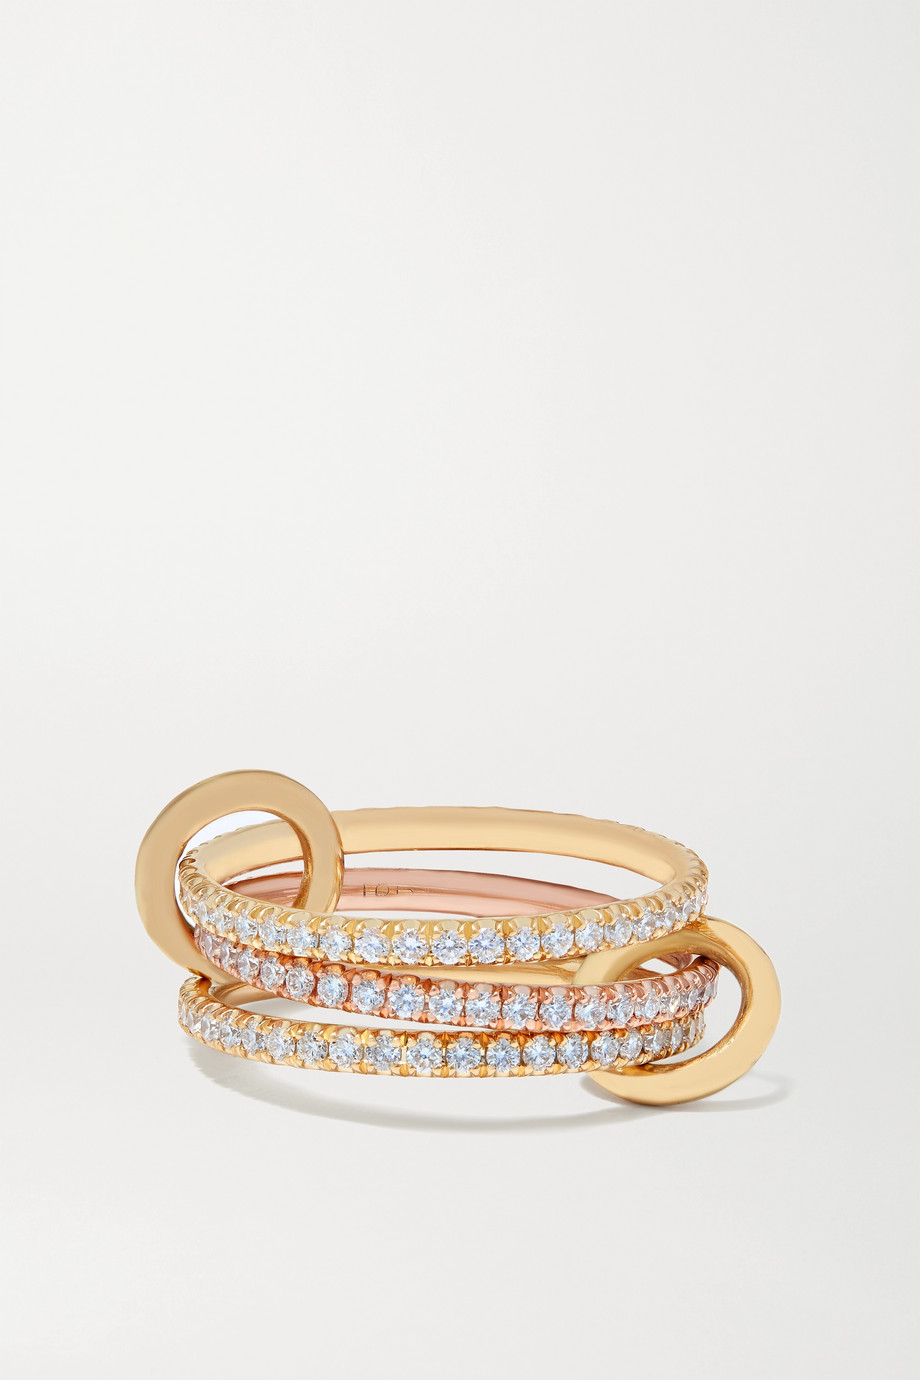 Spinelli Kilcollin Aurora set of three 18-karat yellow and rose gold diamond rings